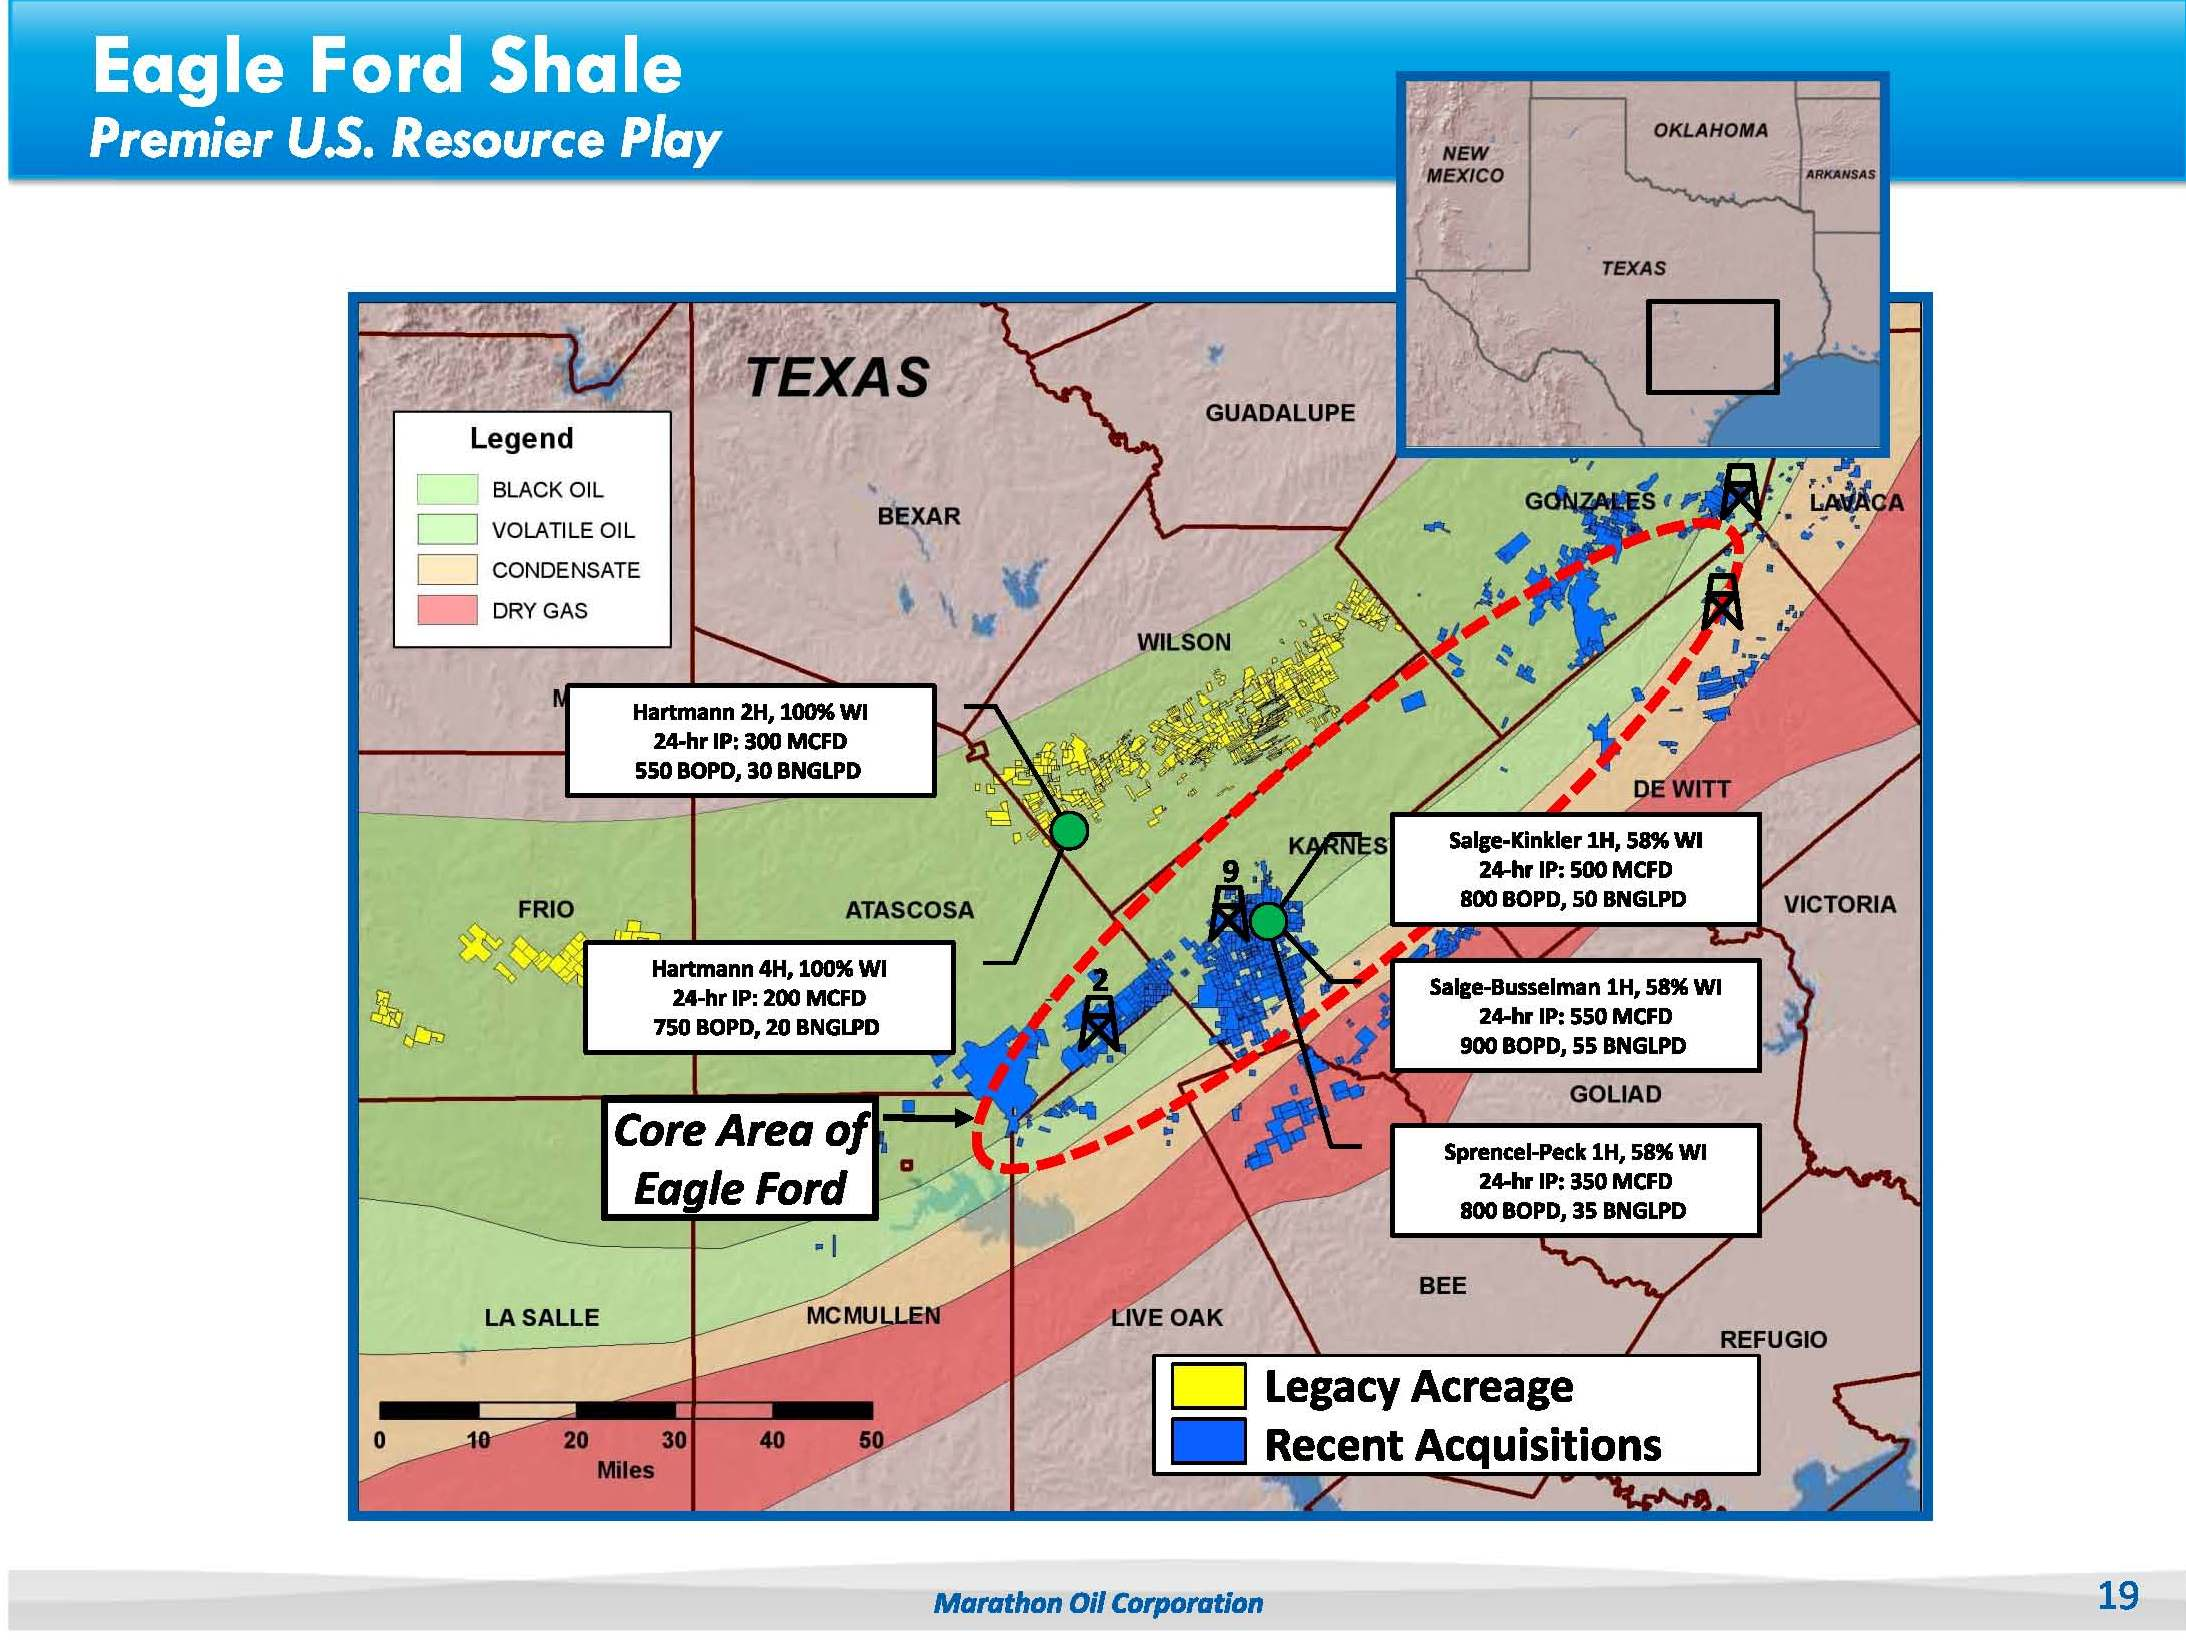 Source: Marathon Oil Presentation